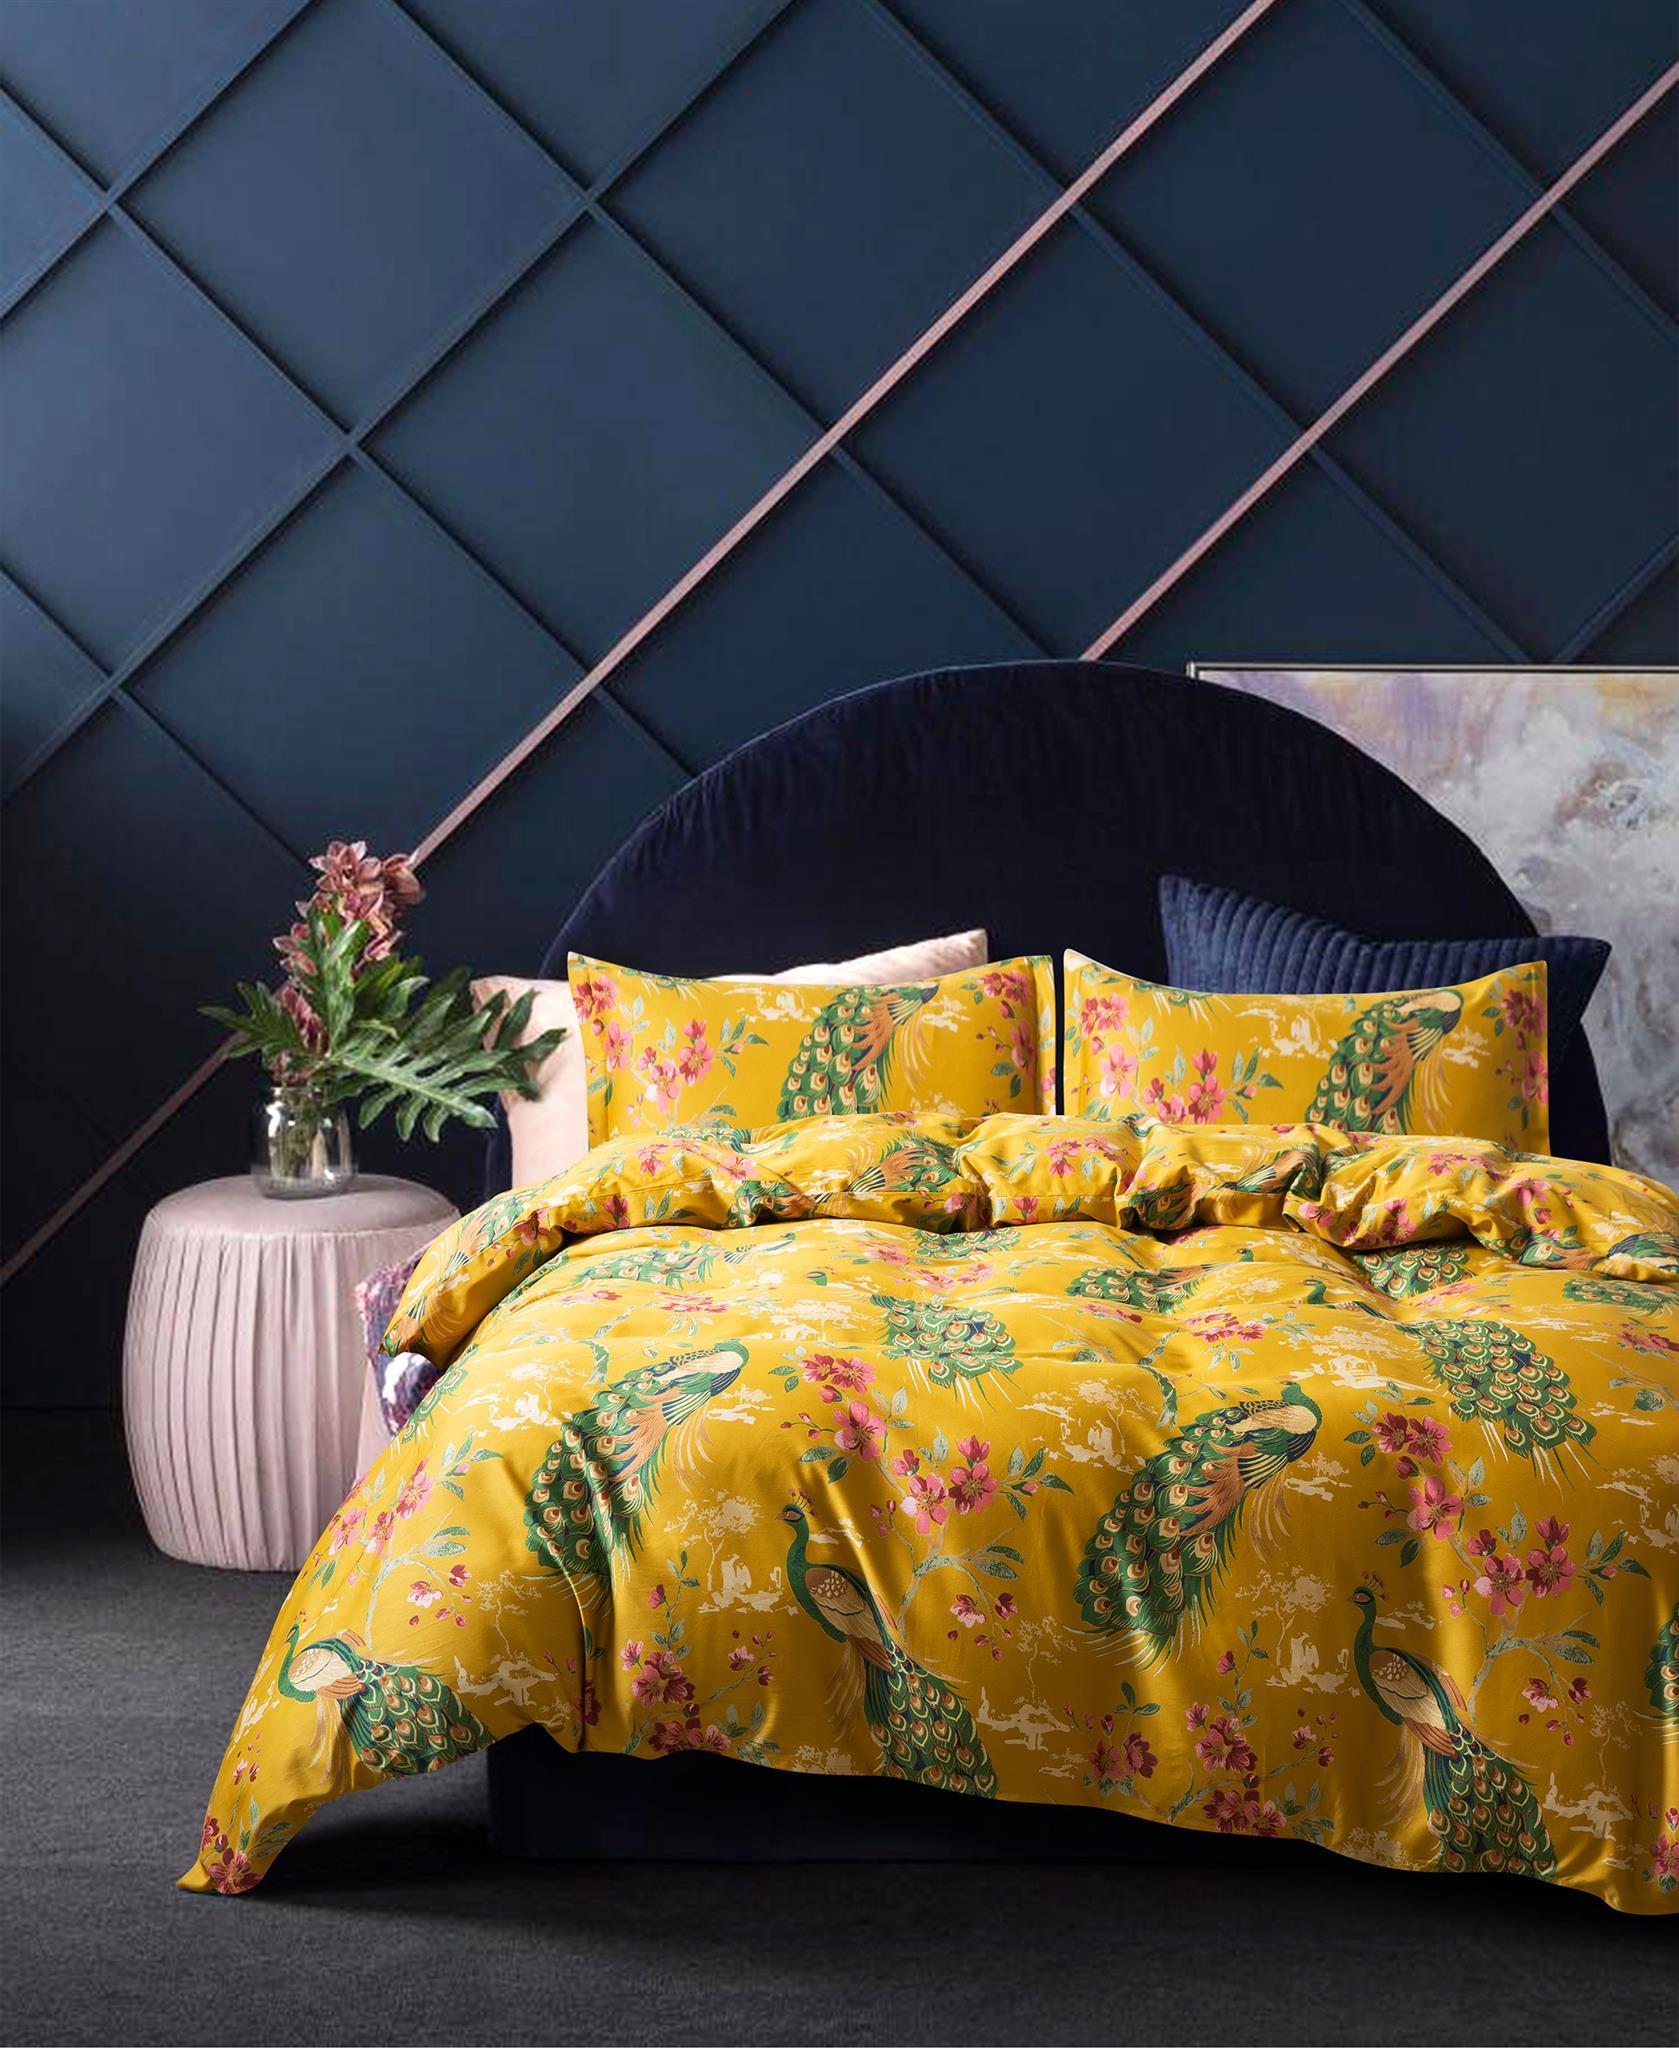 Chinoiserie Yellow Citrine Peacock Sakura Blossom Duvet Cover And Pillowcases Set Eikei